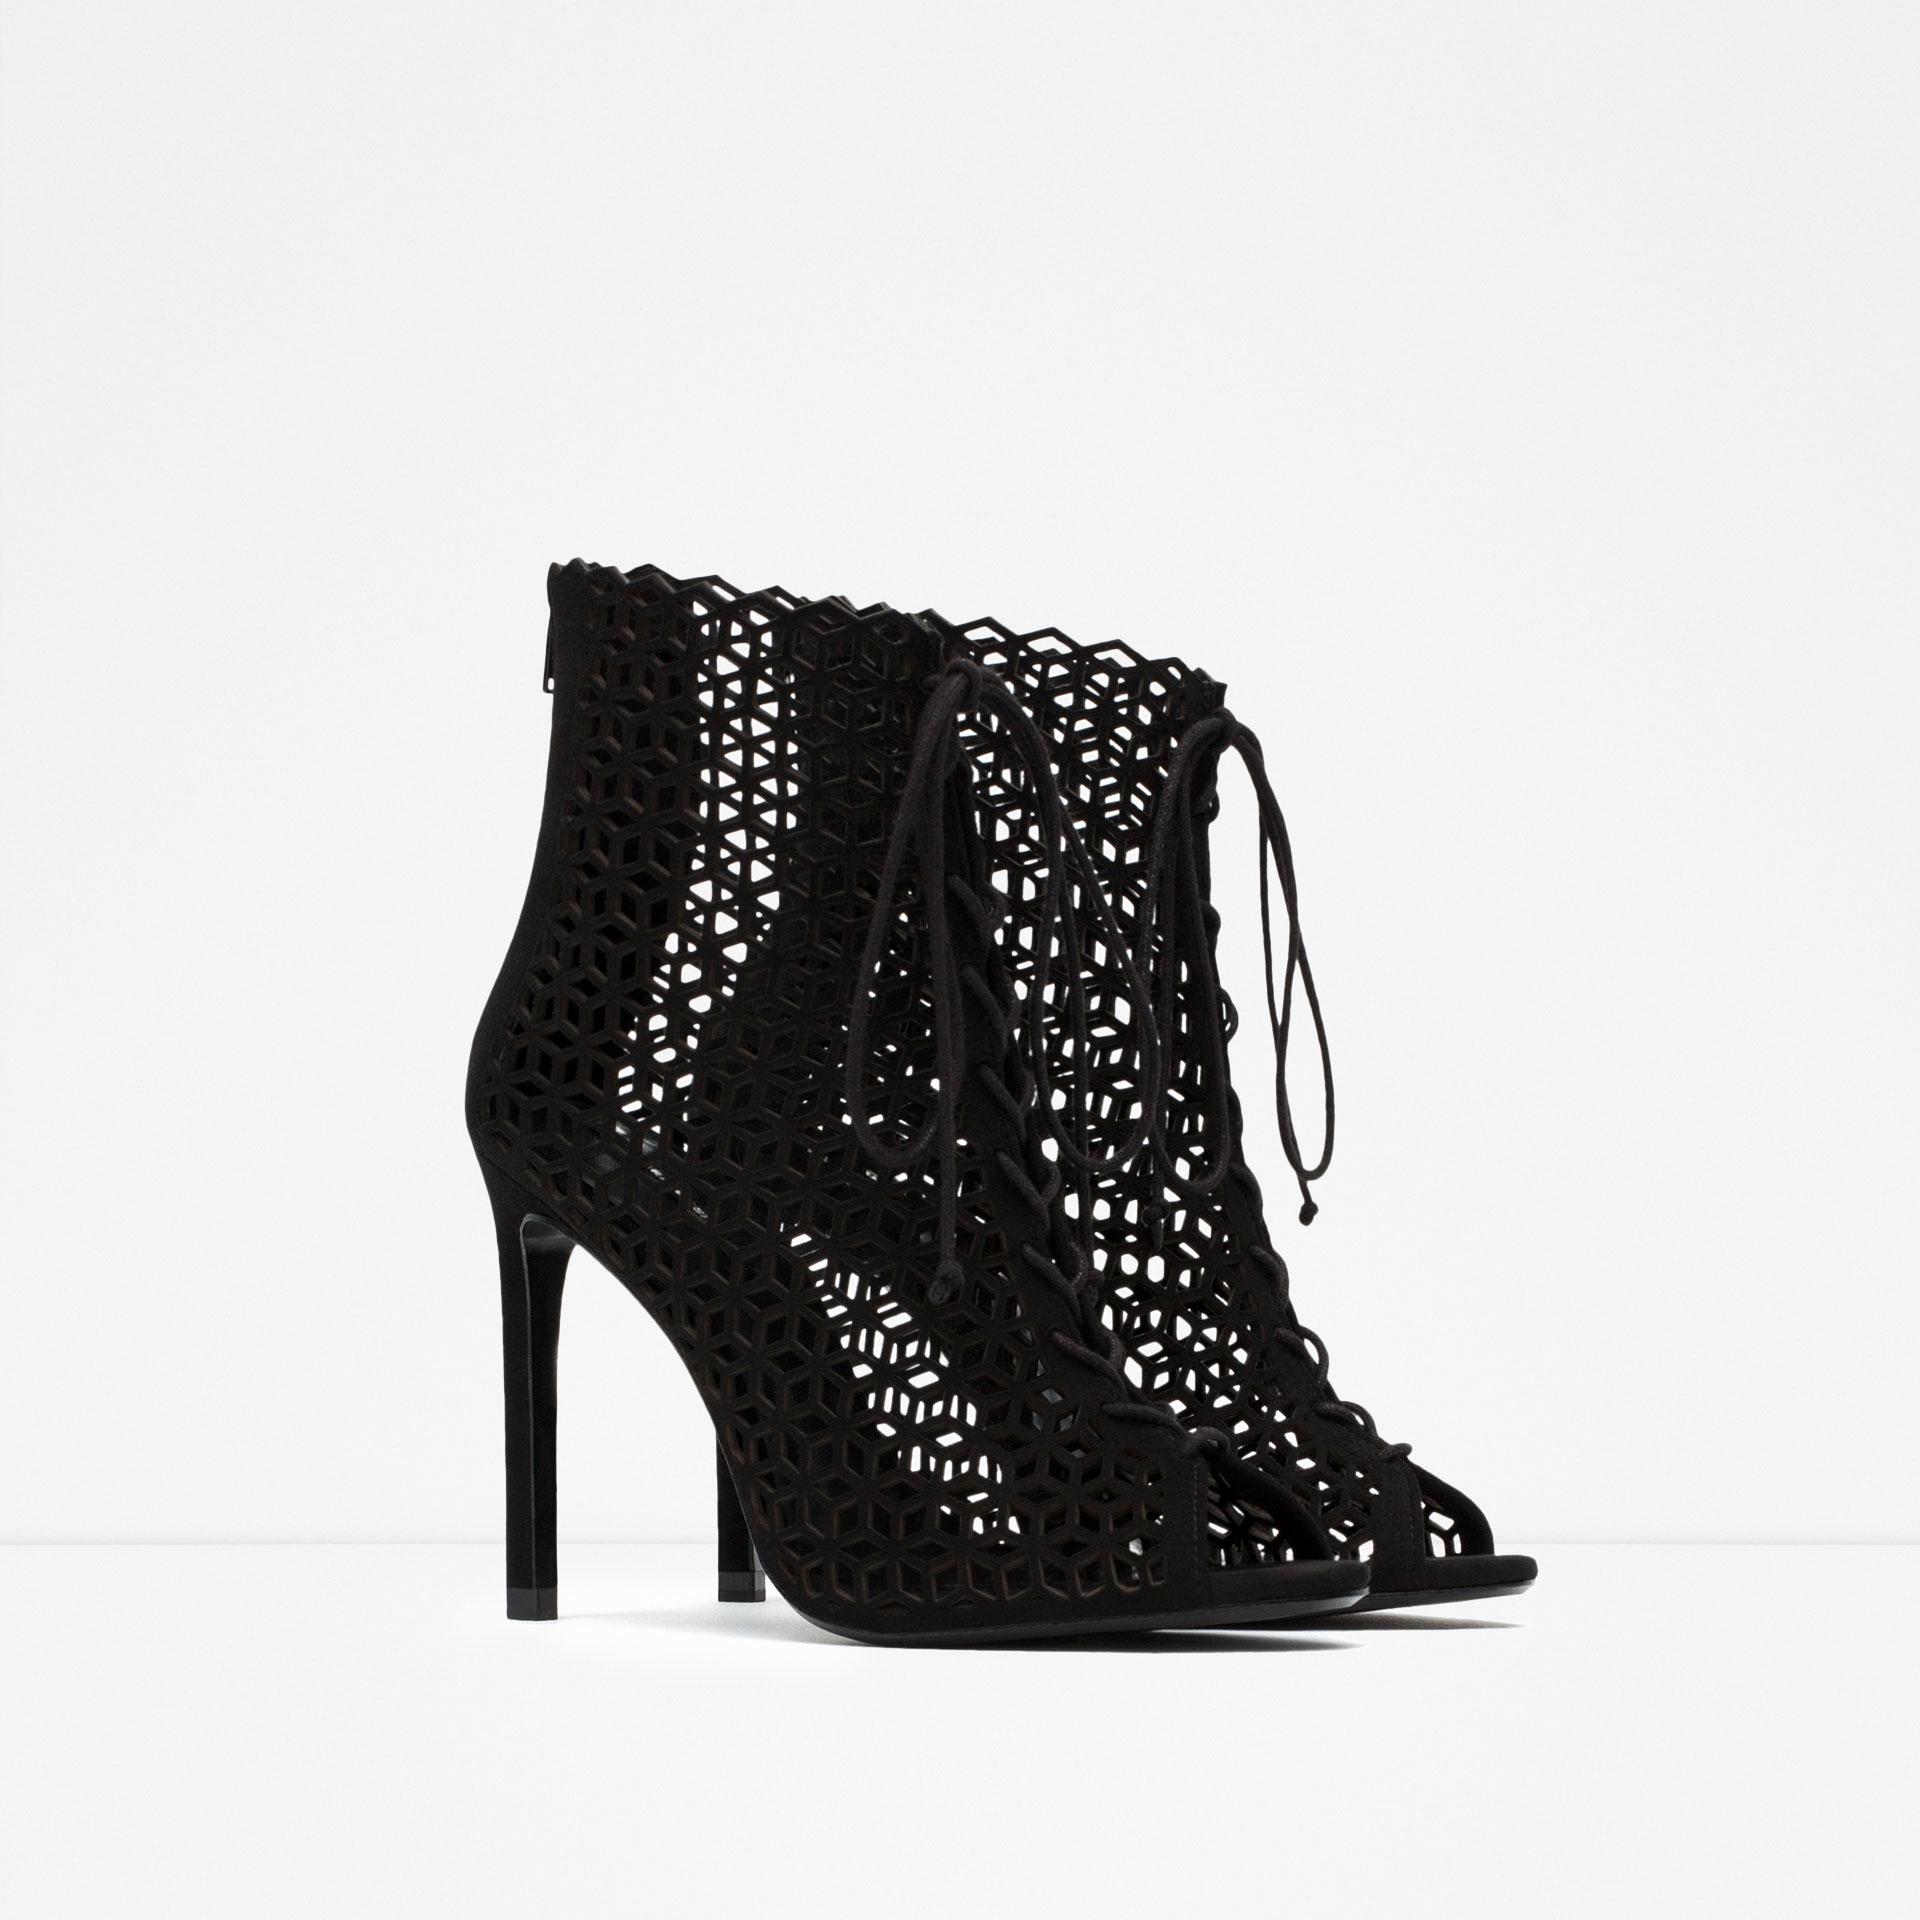 Zara Black Lace Up Heels